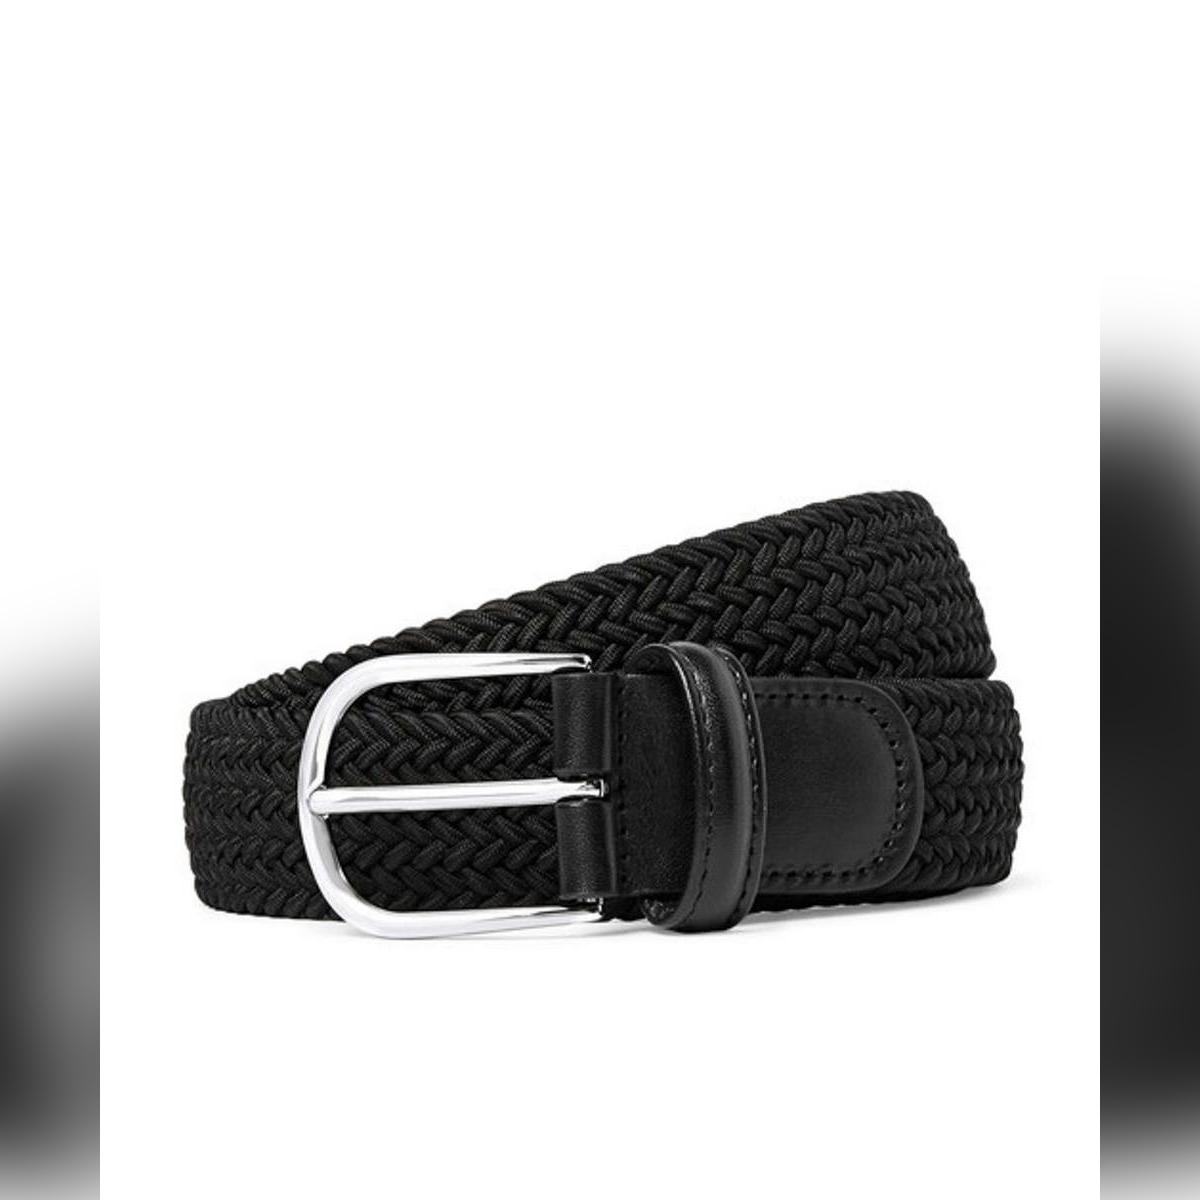 Elastic Belt Canvas Black Faux Leather Elastic Belt for Boy and Girls